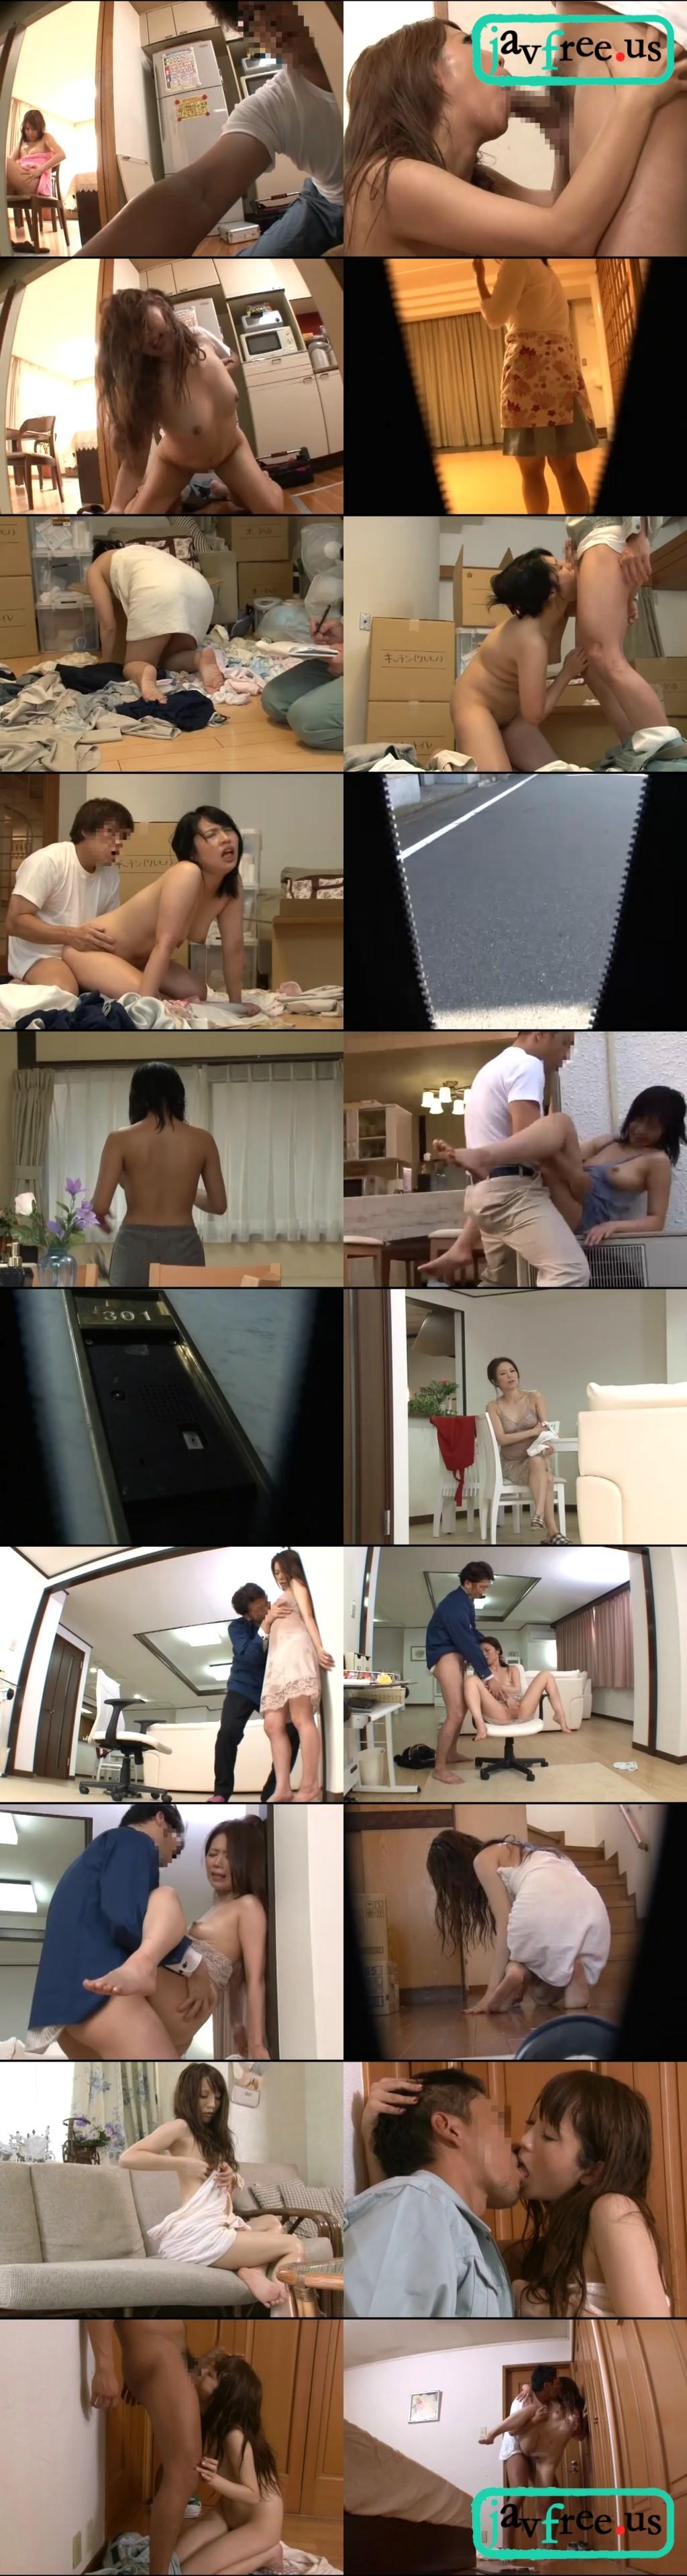 [DANDY-263] 「昼間から風呂に入っている湯上がり美人妻がしかける火照った体を見せつけながら密着してくる誘惑サインを見逃すな!」 VOL.3 - image DANDY-263 on https://javfree.me